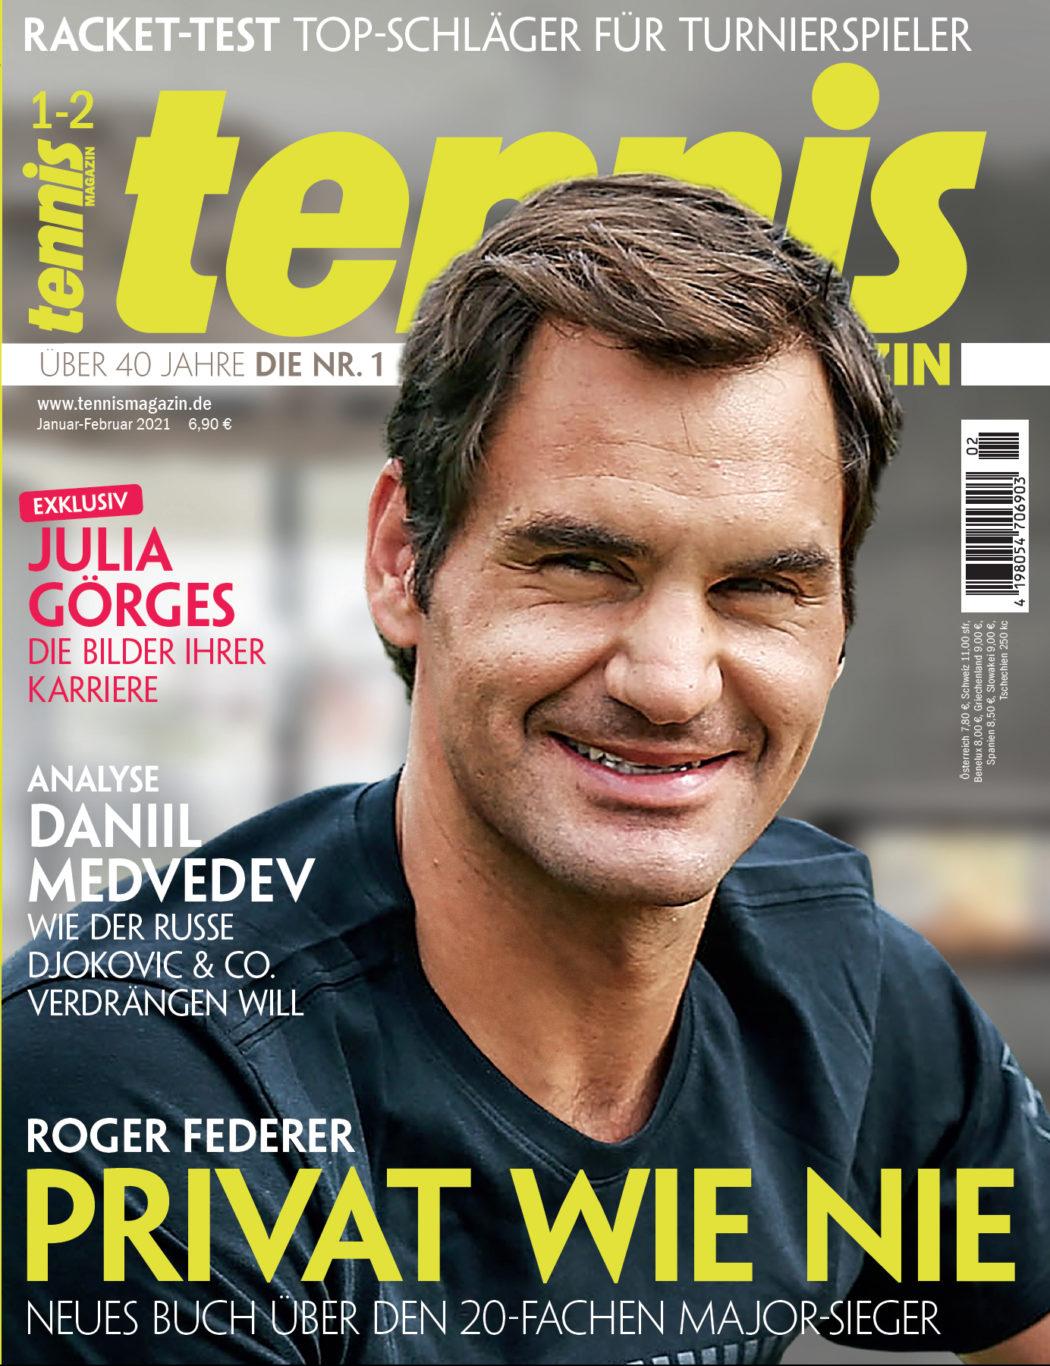 Titel_Federer_1_2_2021